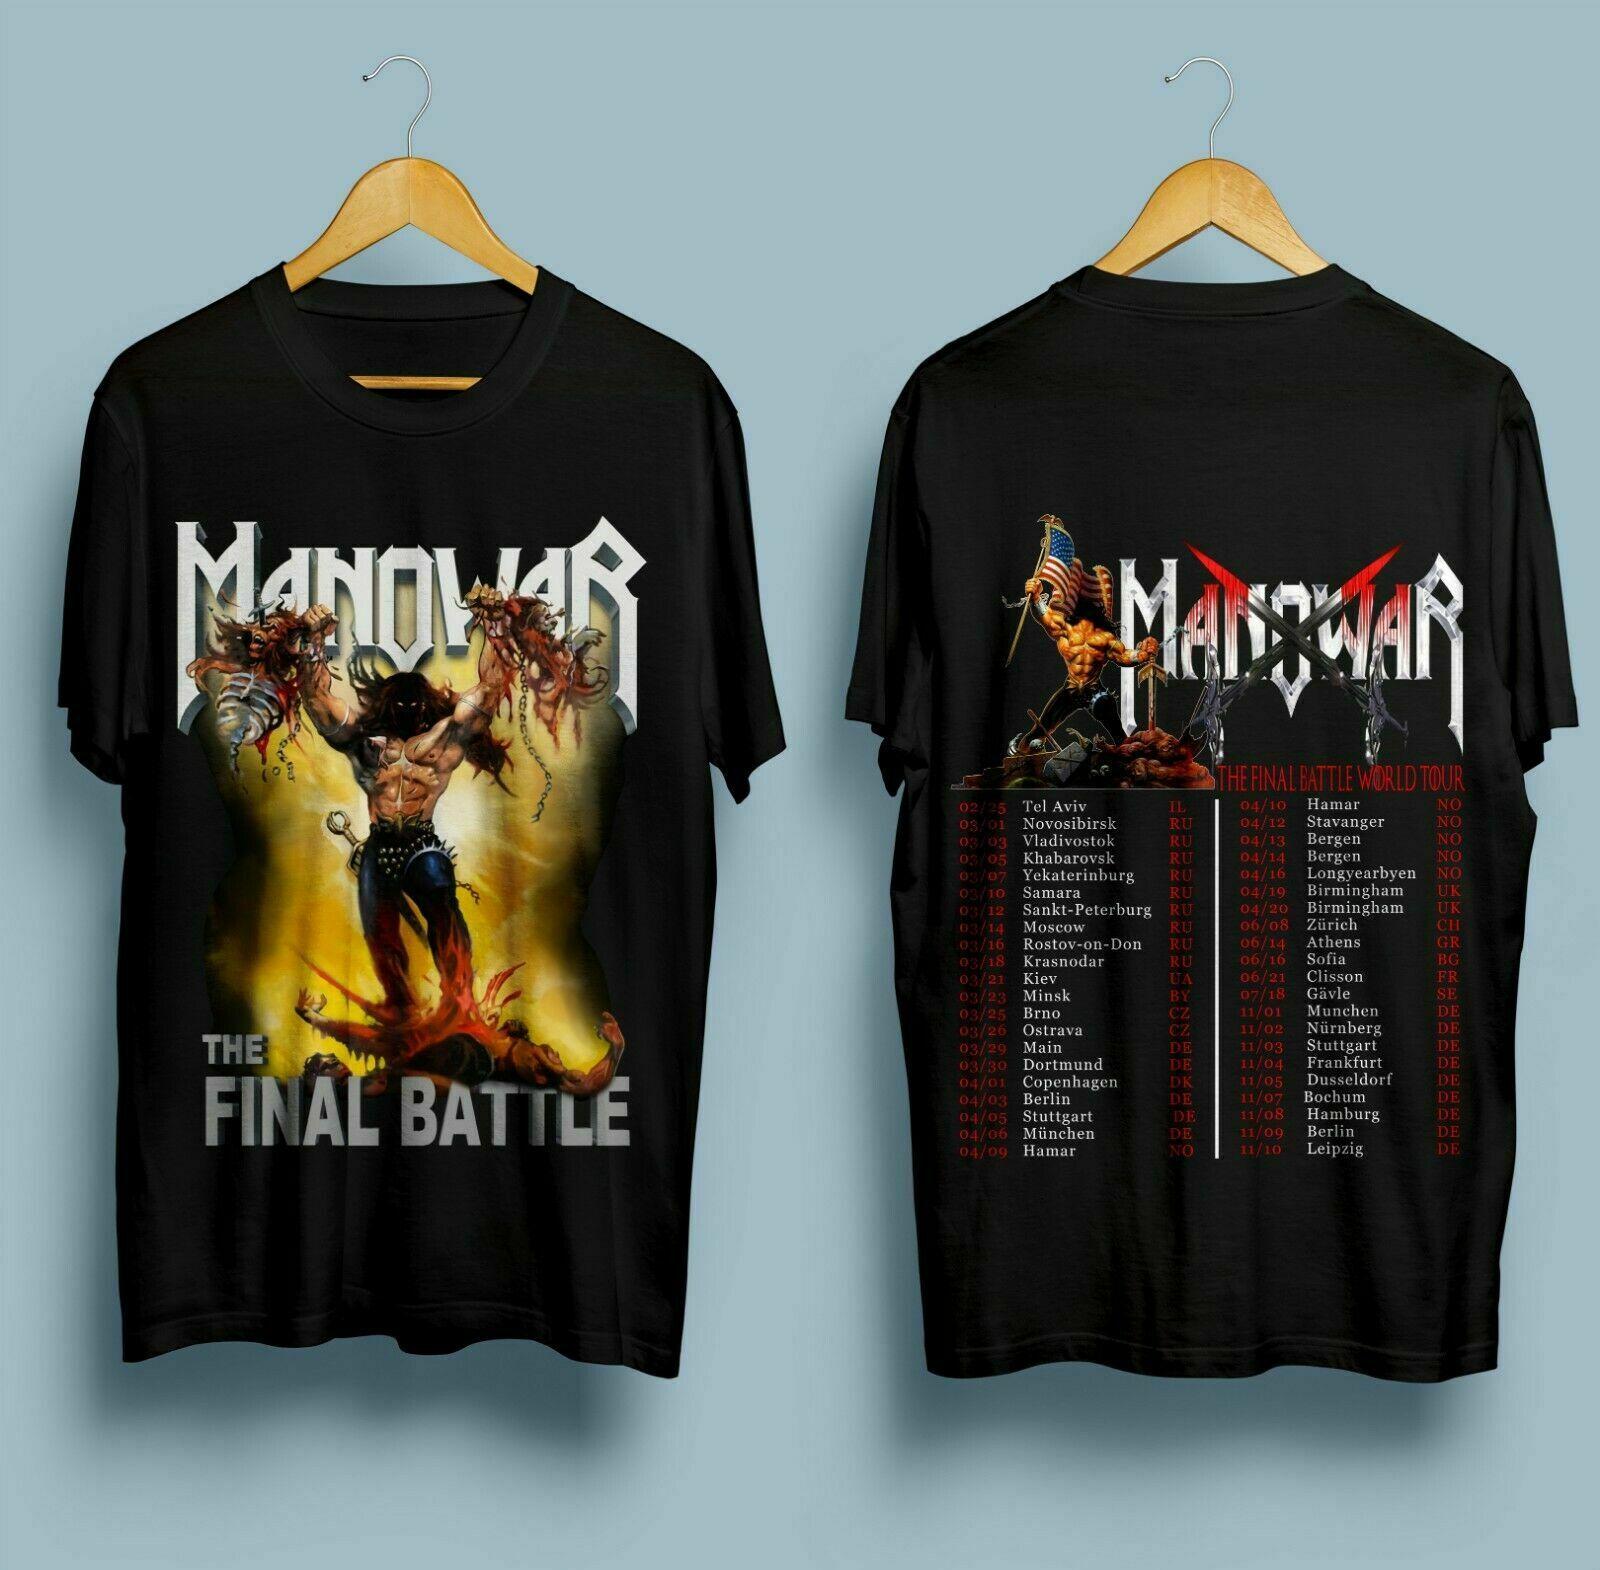 Nuevo Manowar The Final World Tour 2019 negro camiseta tamaño S-2XL Camiseta estilo Verano Divertido